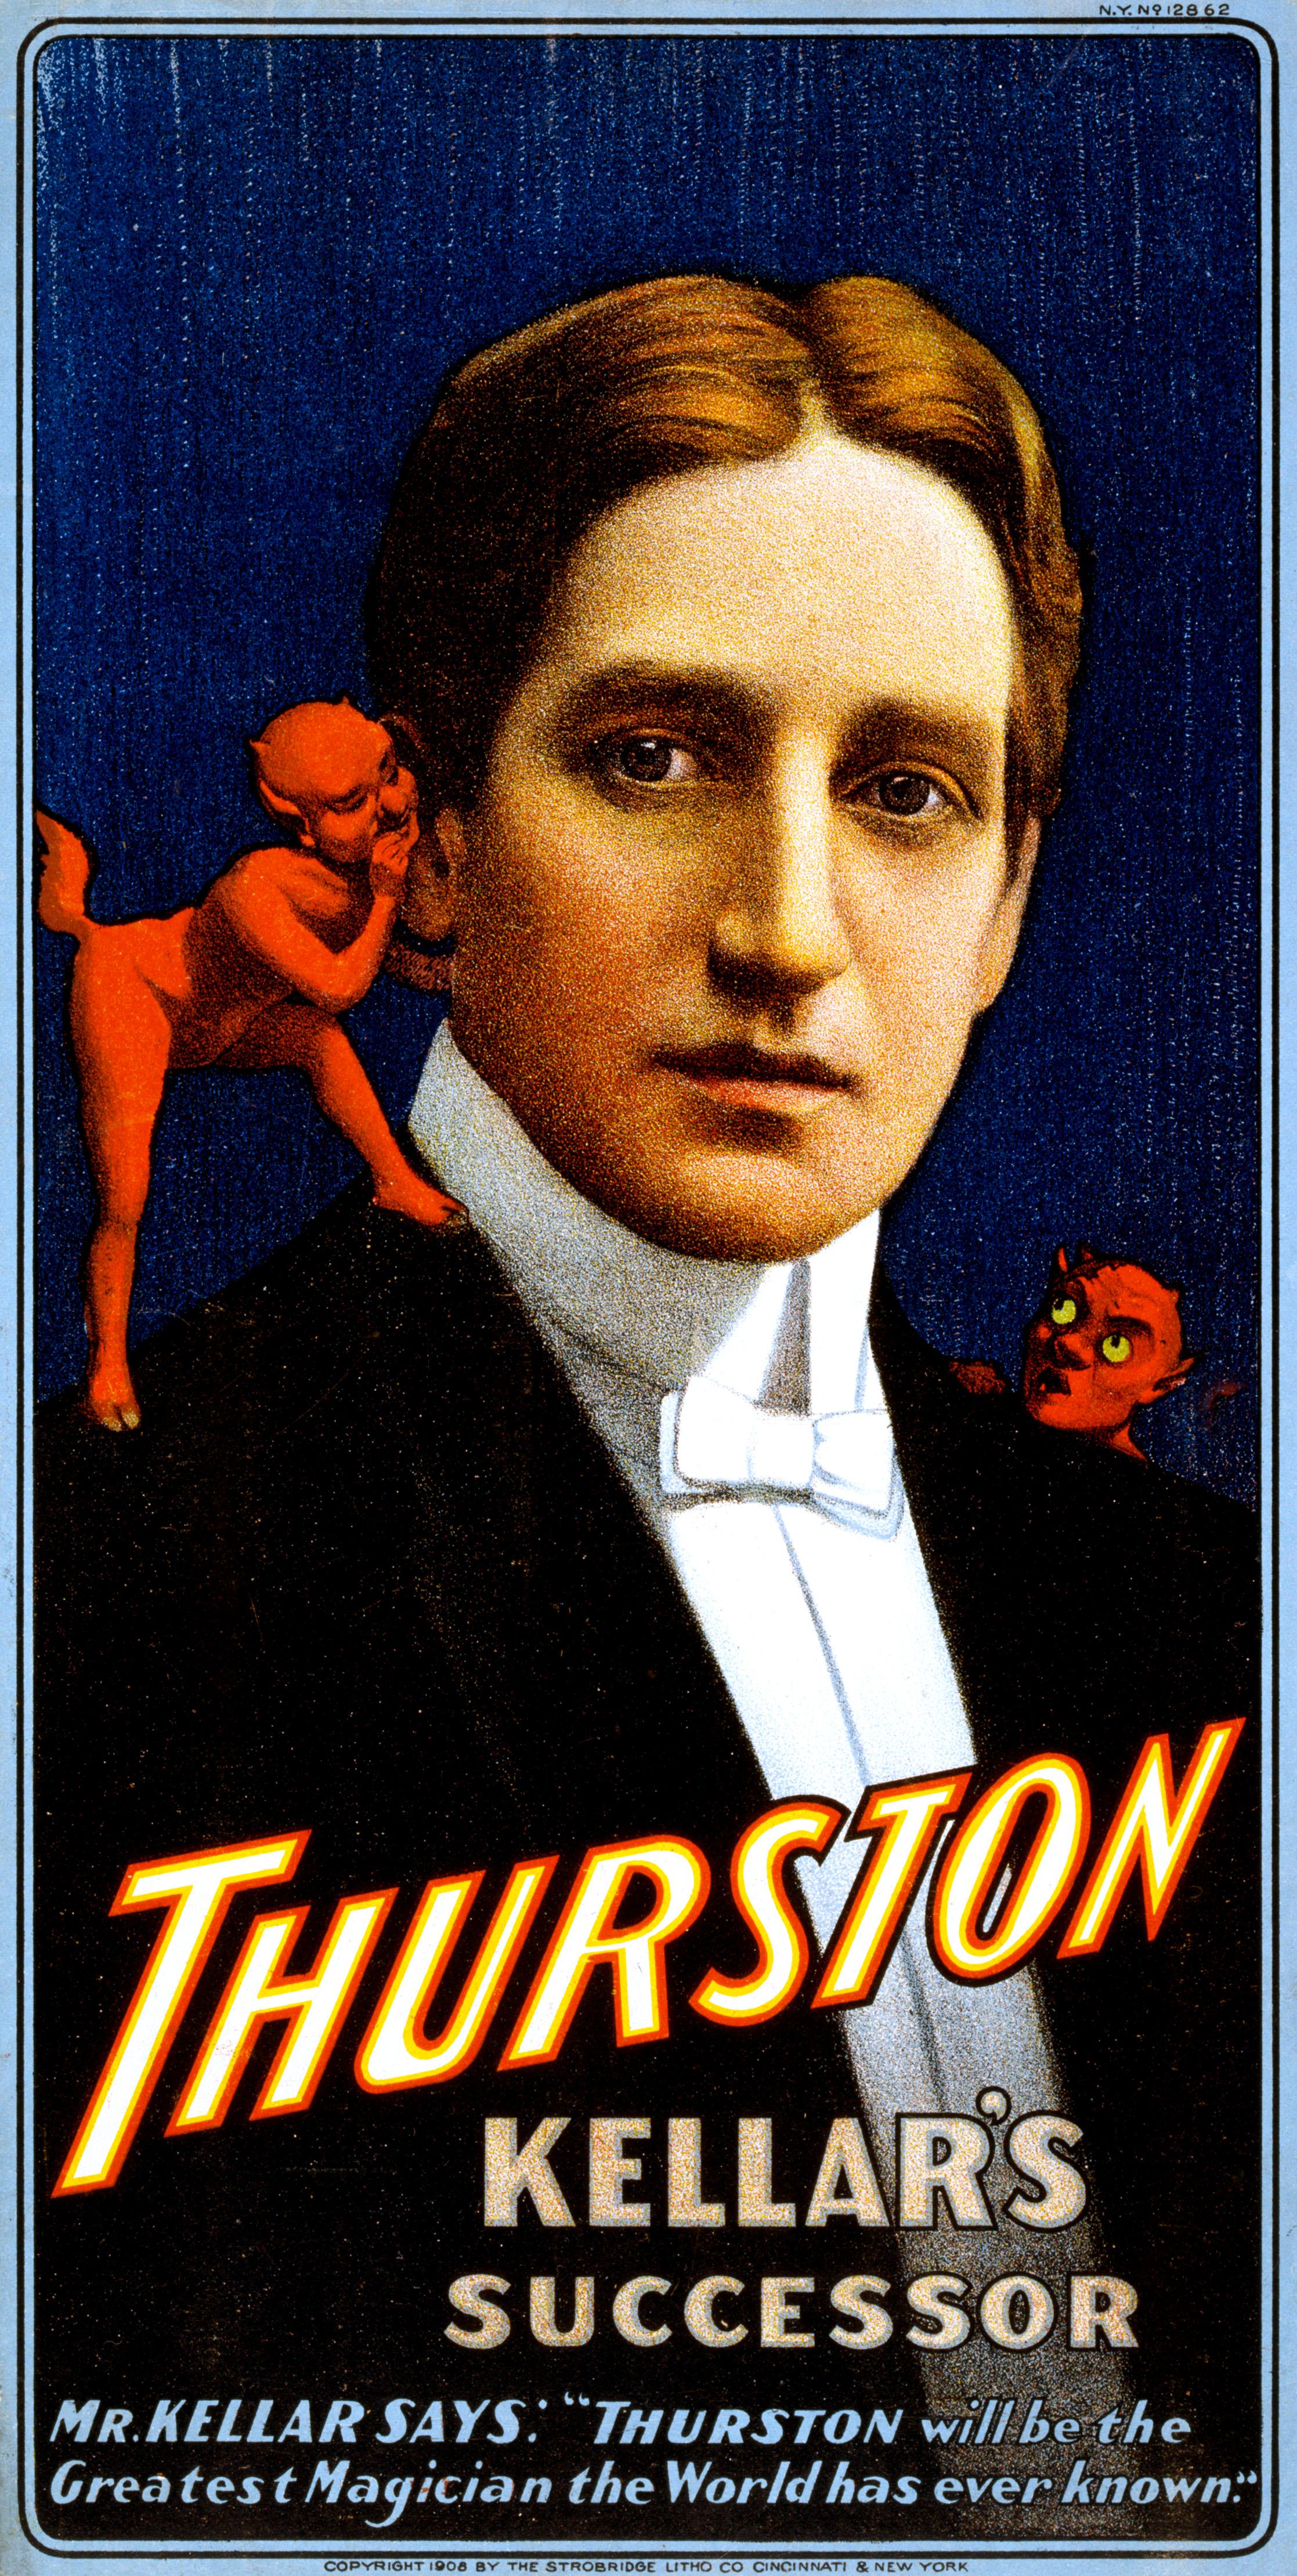 Magician From The Crystal Visions Tarot: Thurston, Kellar's